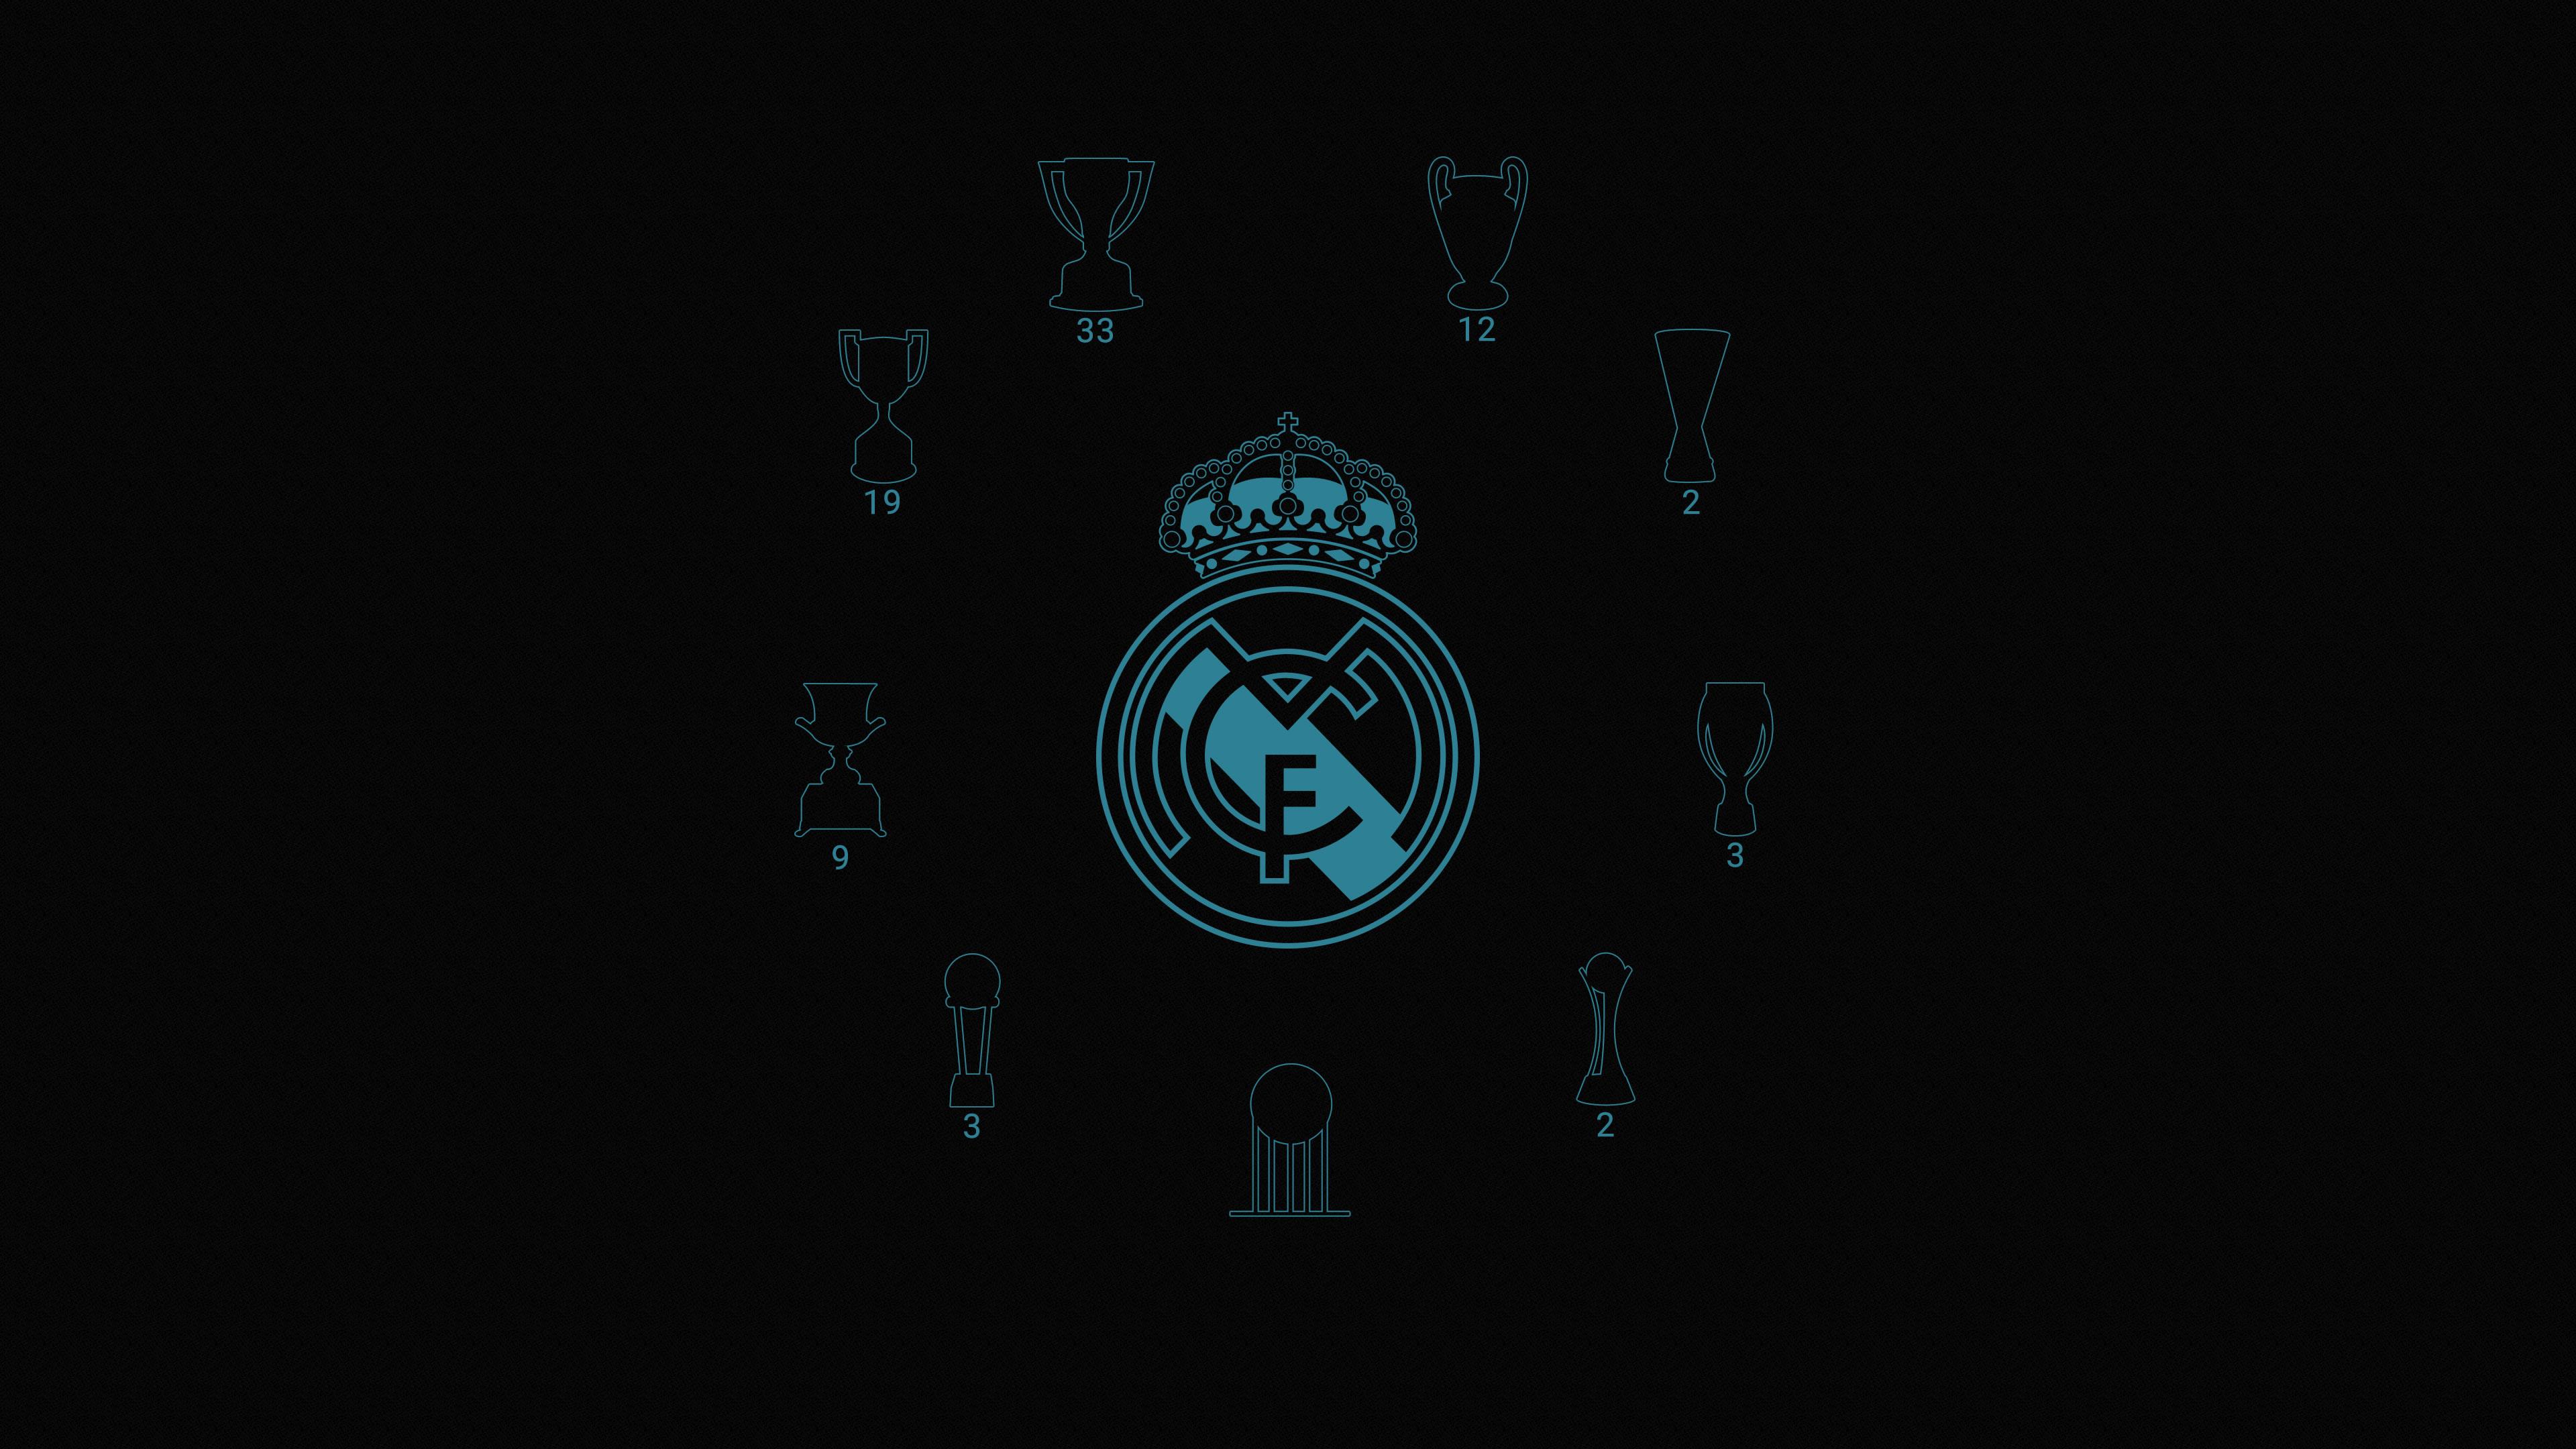 ... Real Madrid Away Wallpaper (2017/18) by khalidvawda